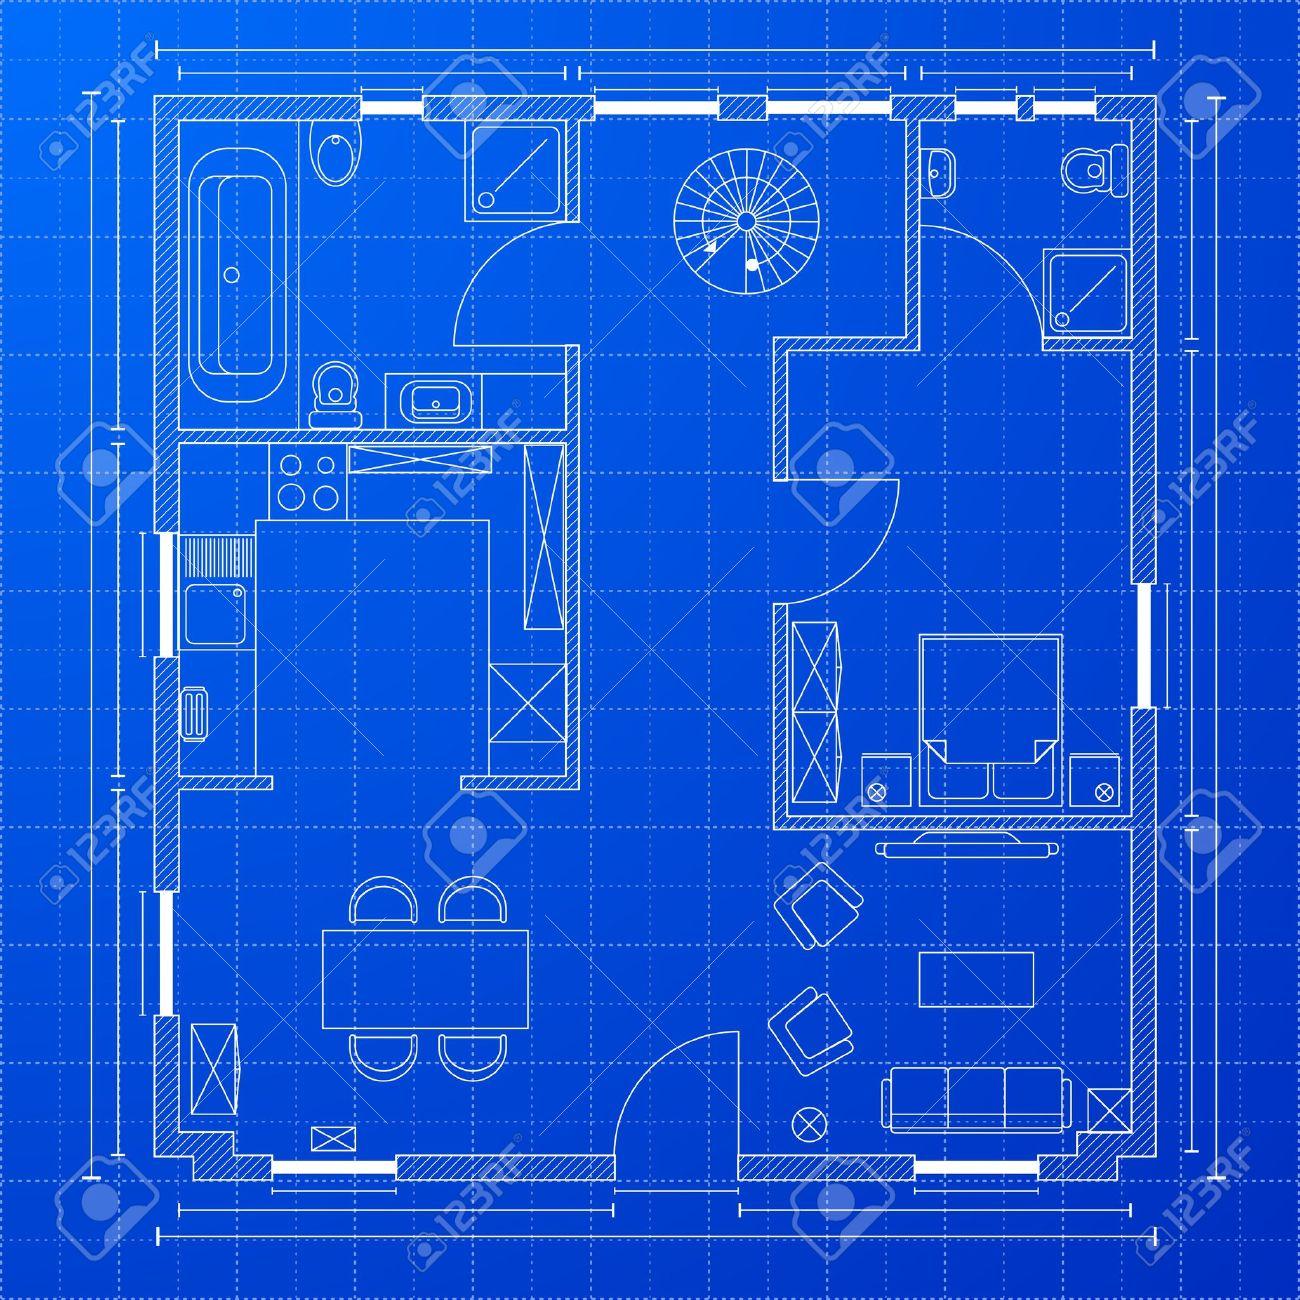 17754552 Detailed Illustration Of A Blueprint Floorplan Stock Vector Blueprint House Blue House Blueprint On Blueprint